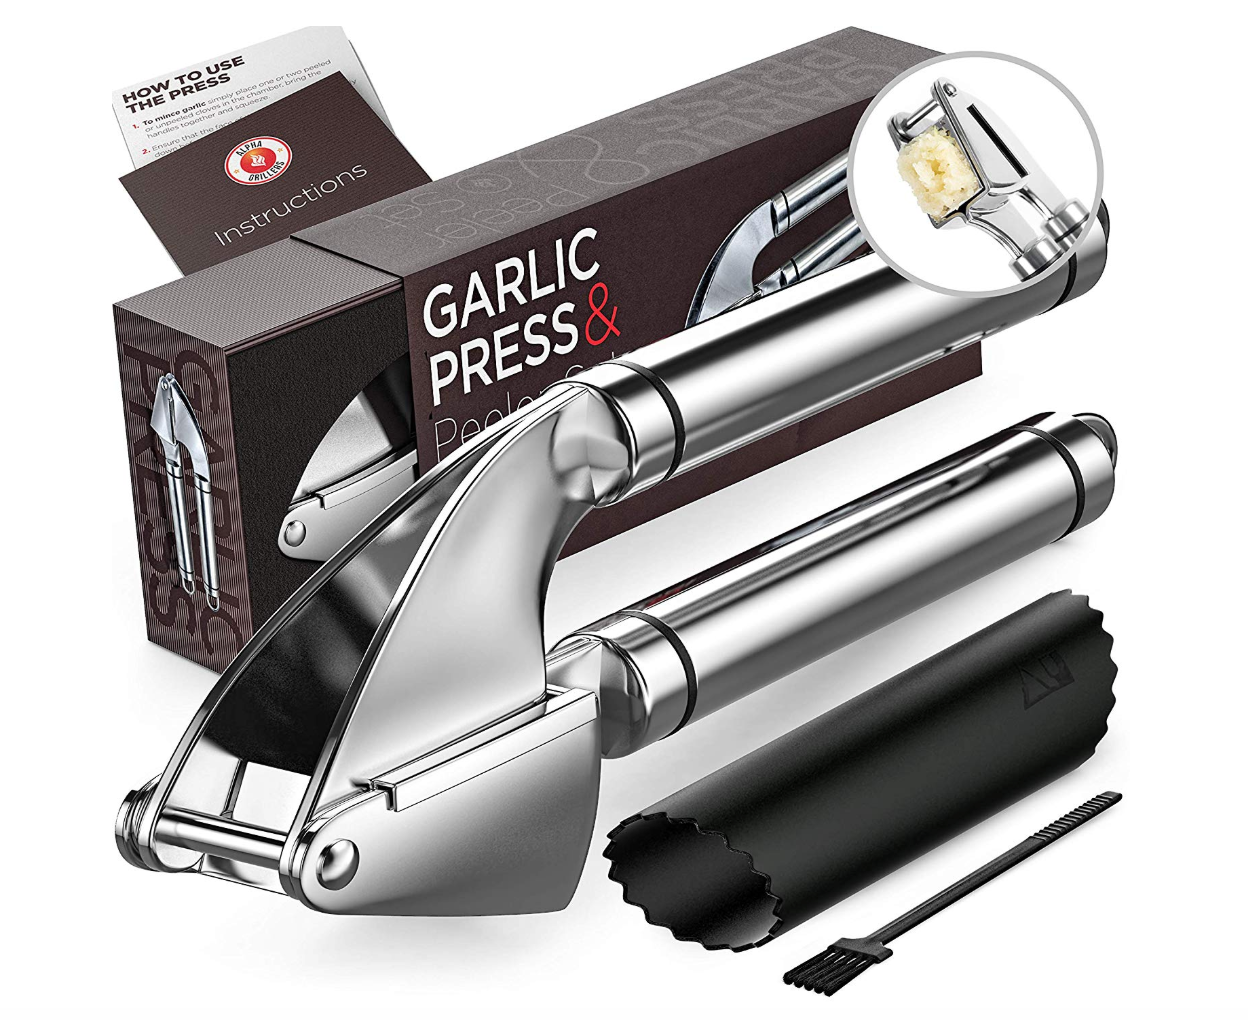 Alpha Grillers Garlic Press